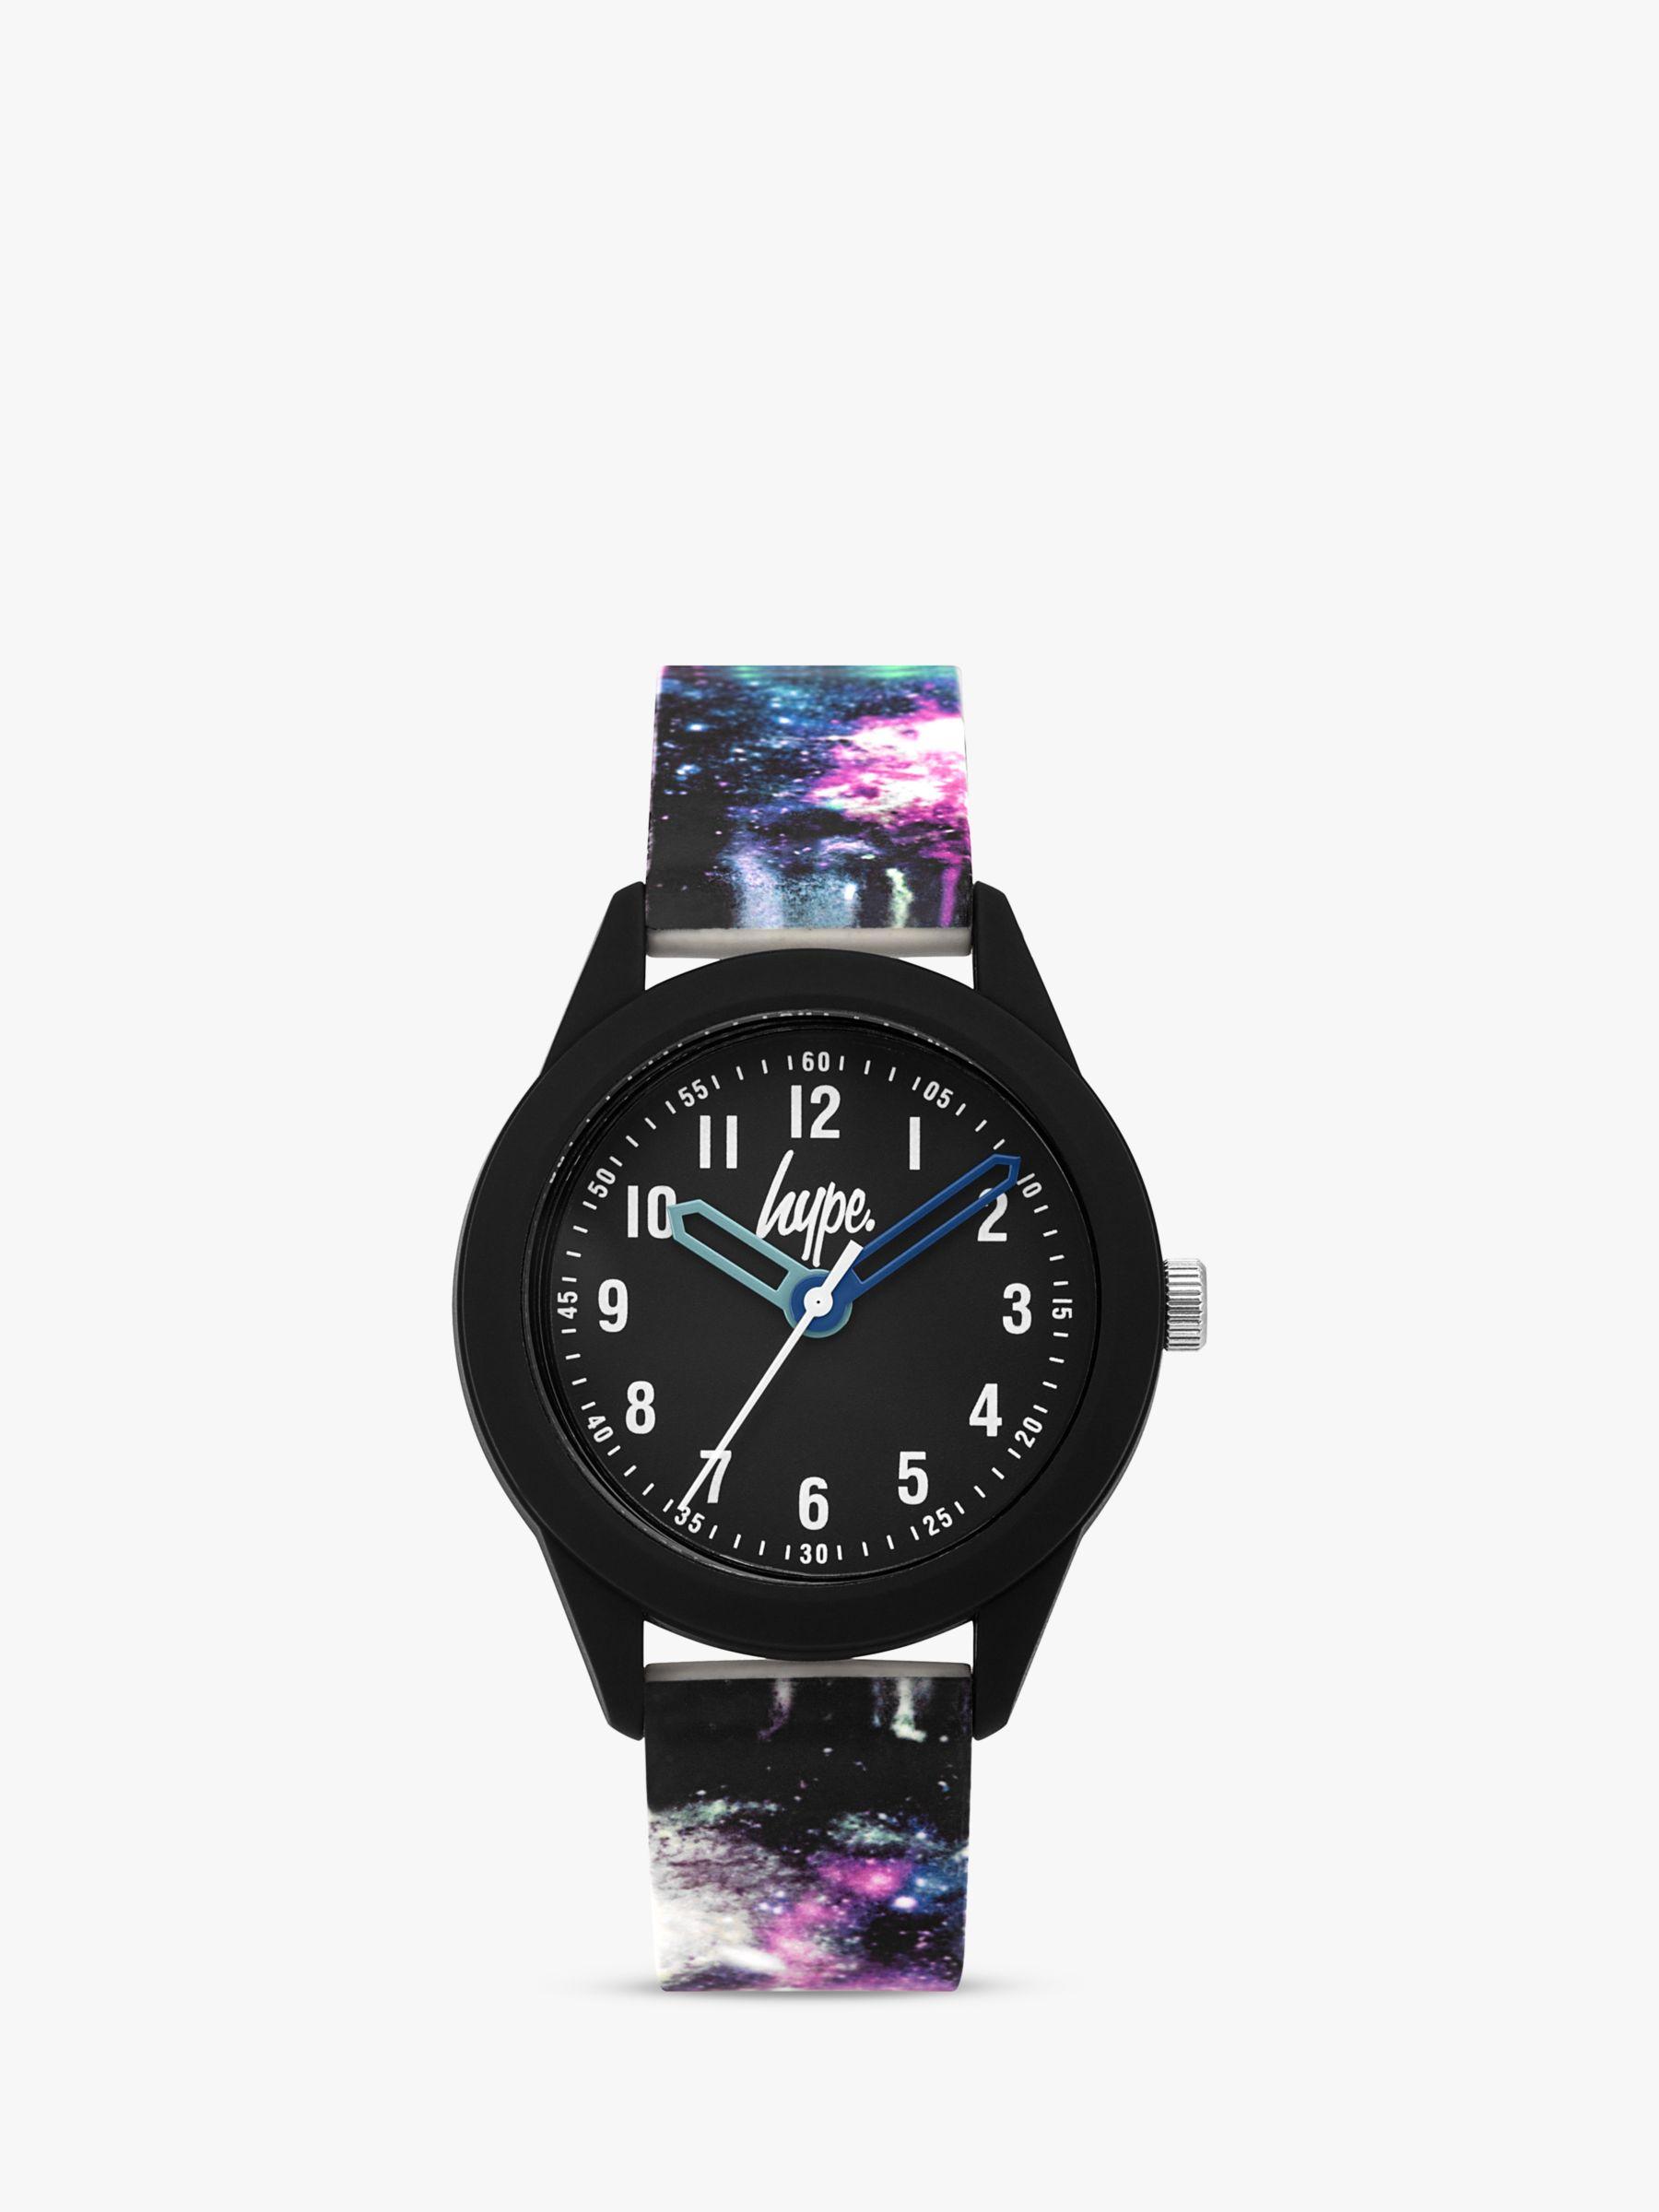 Hype Hype HYK007BV Children's Silicone Strap Watch, Multi/Black